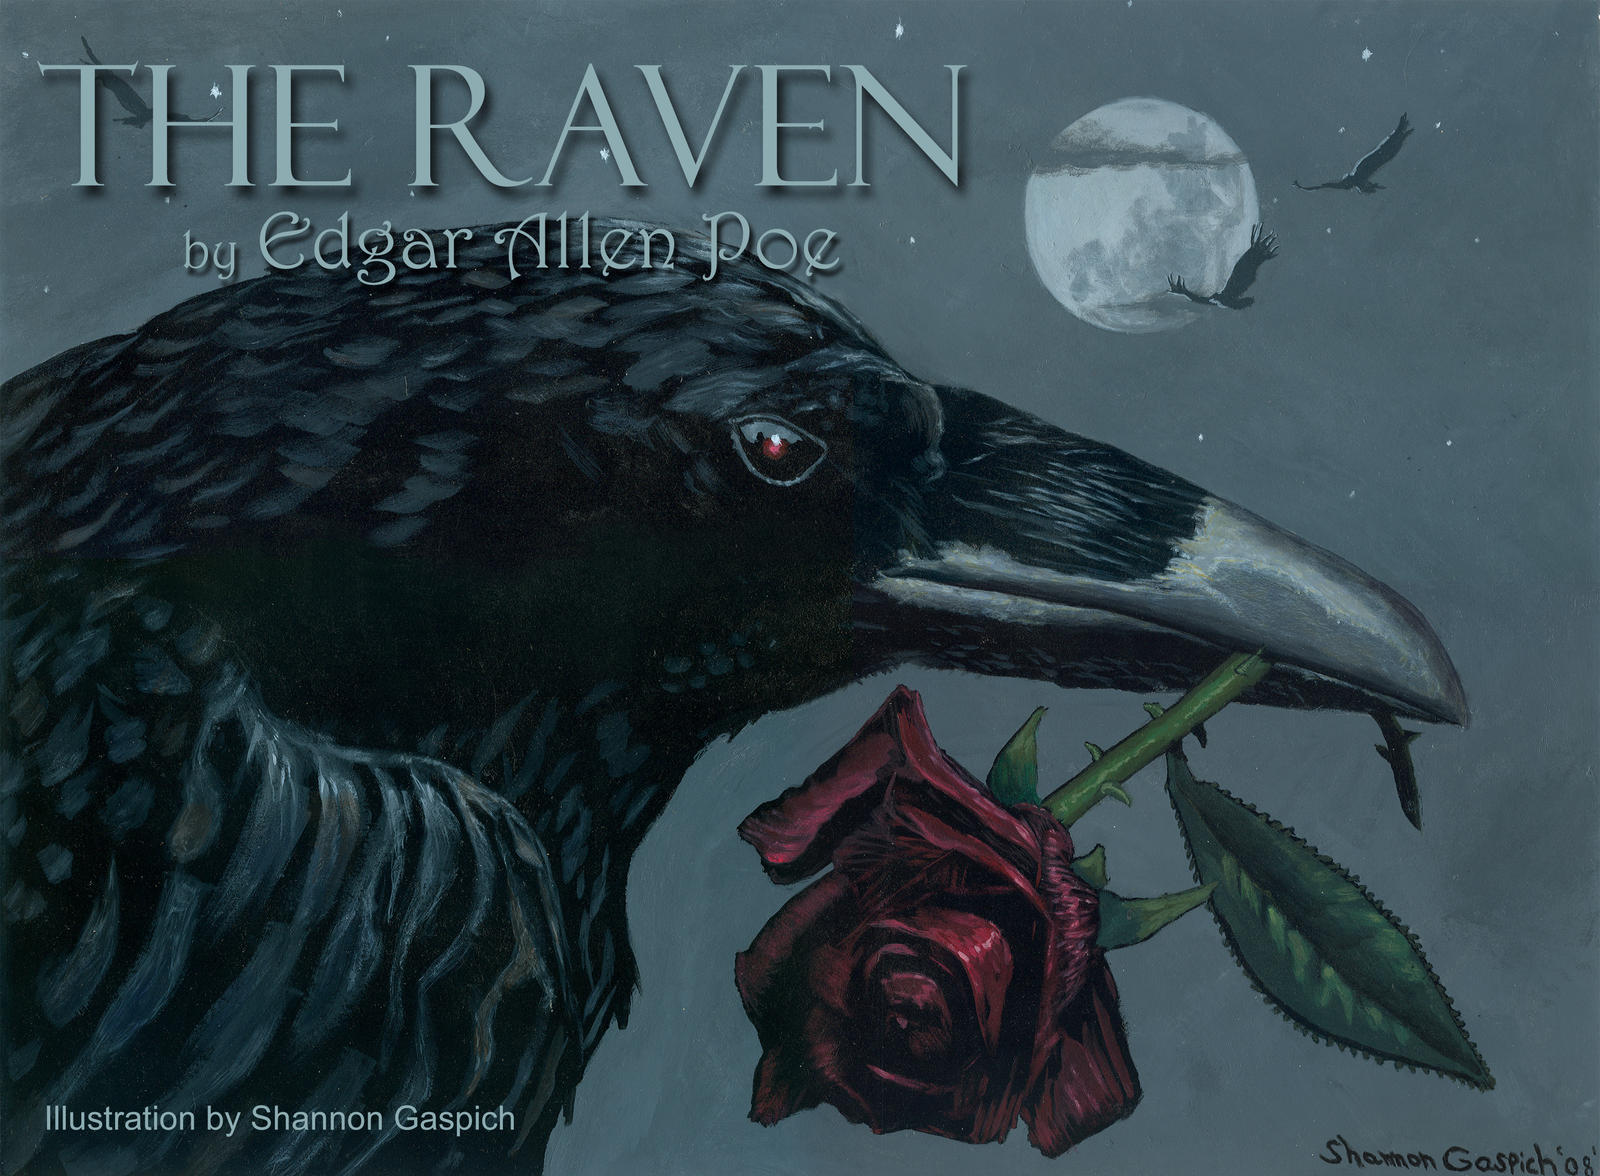 Populaire The Raven :Edgar Allen Poe: by Shannon-Gaspich-1981 on DeviantArt IT34